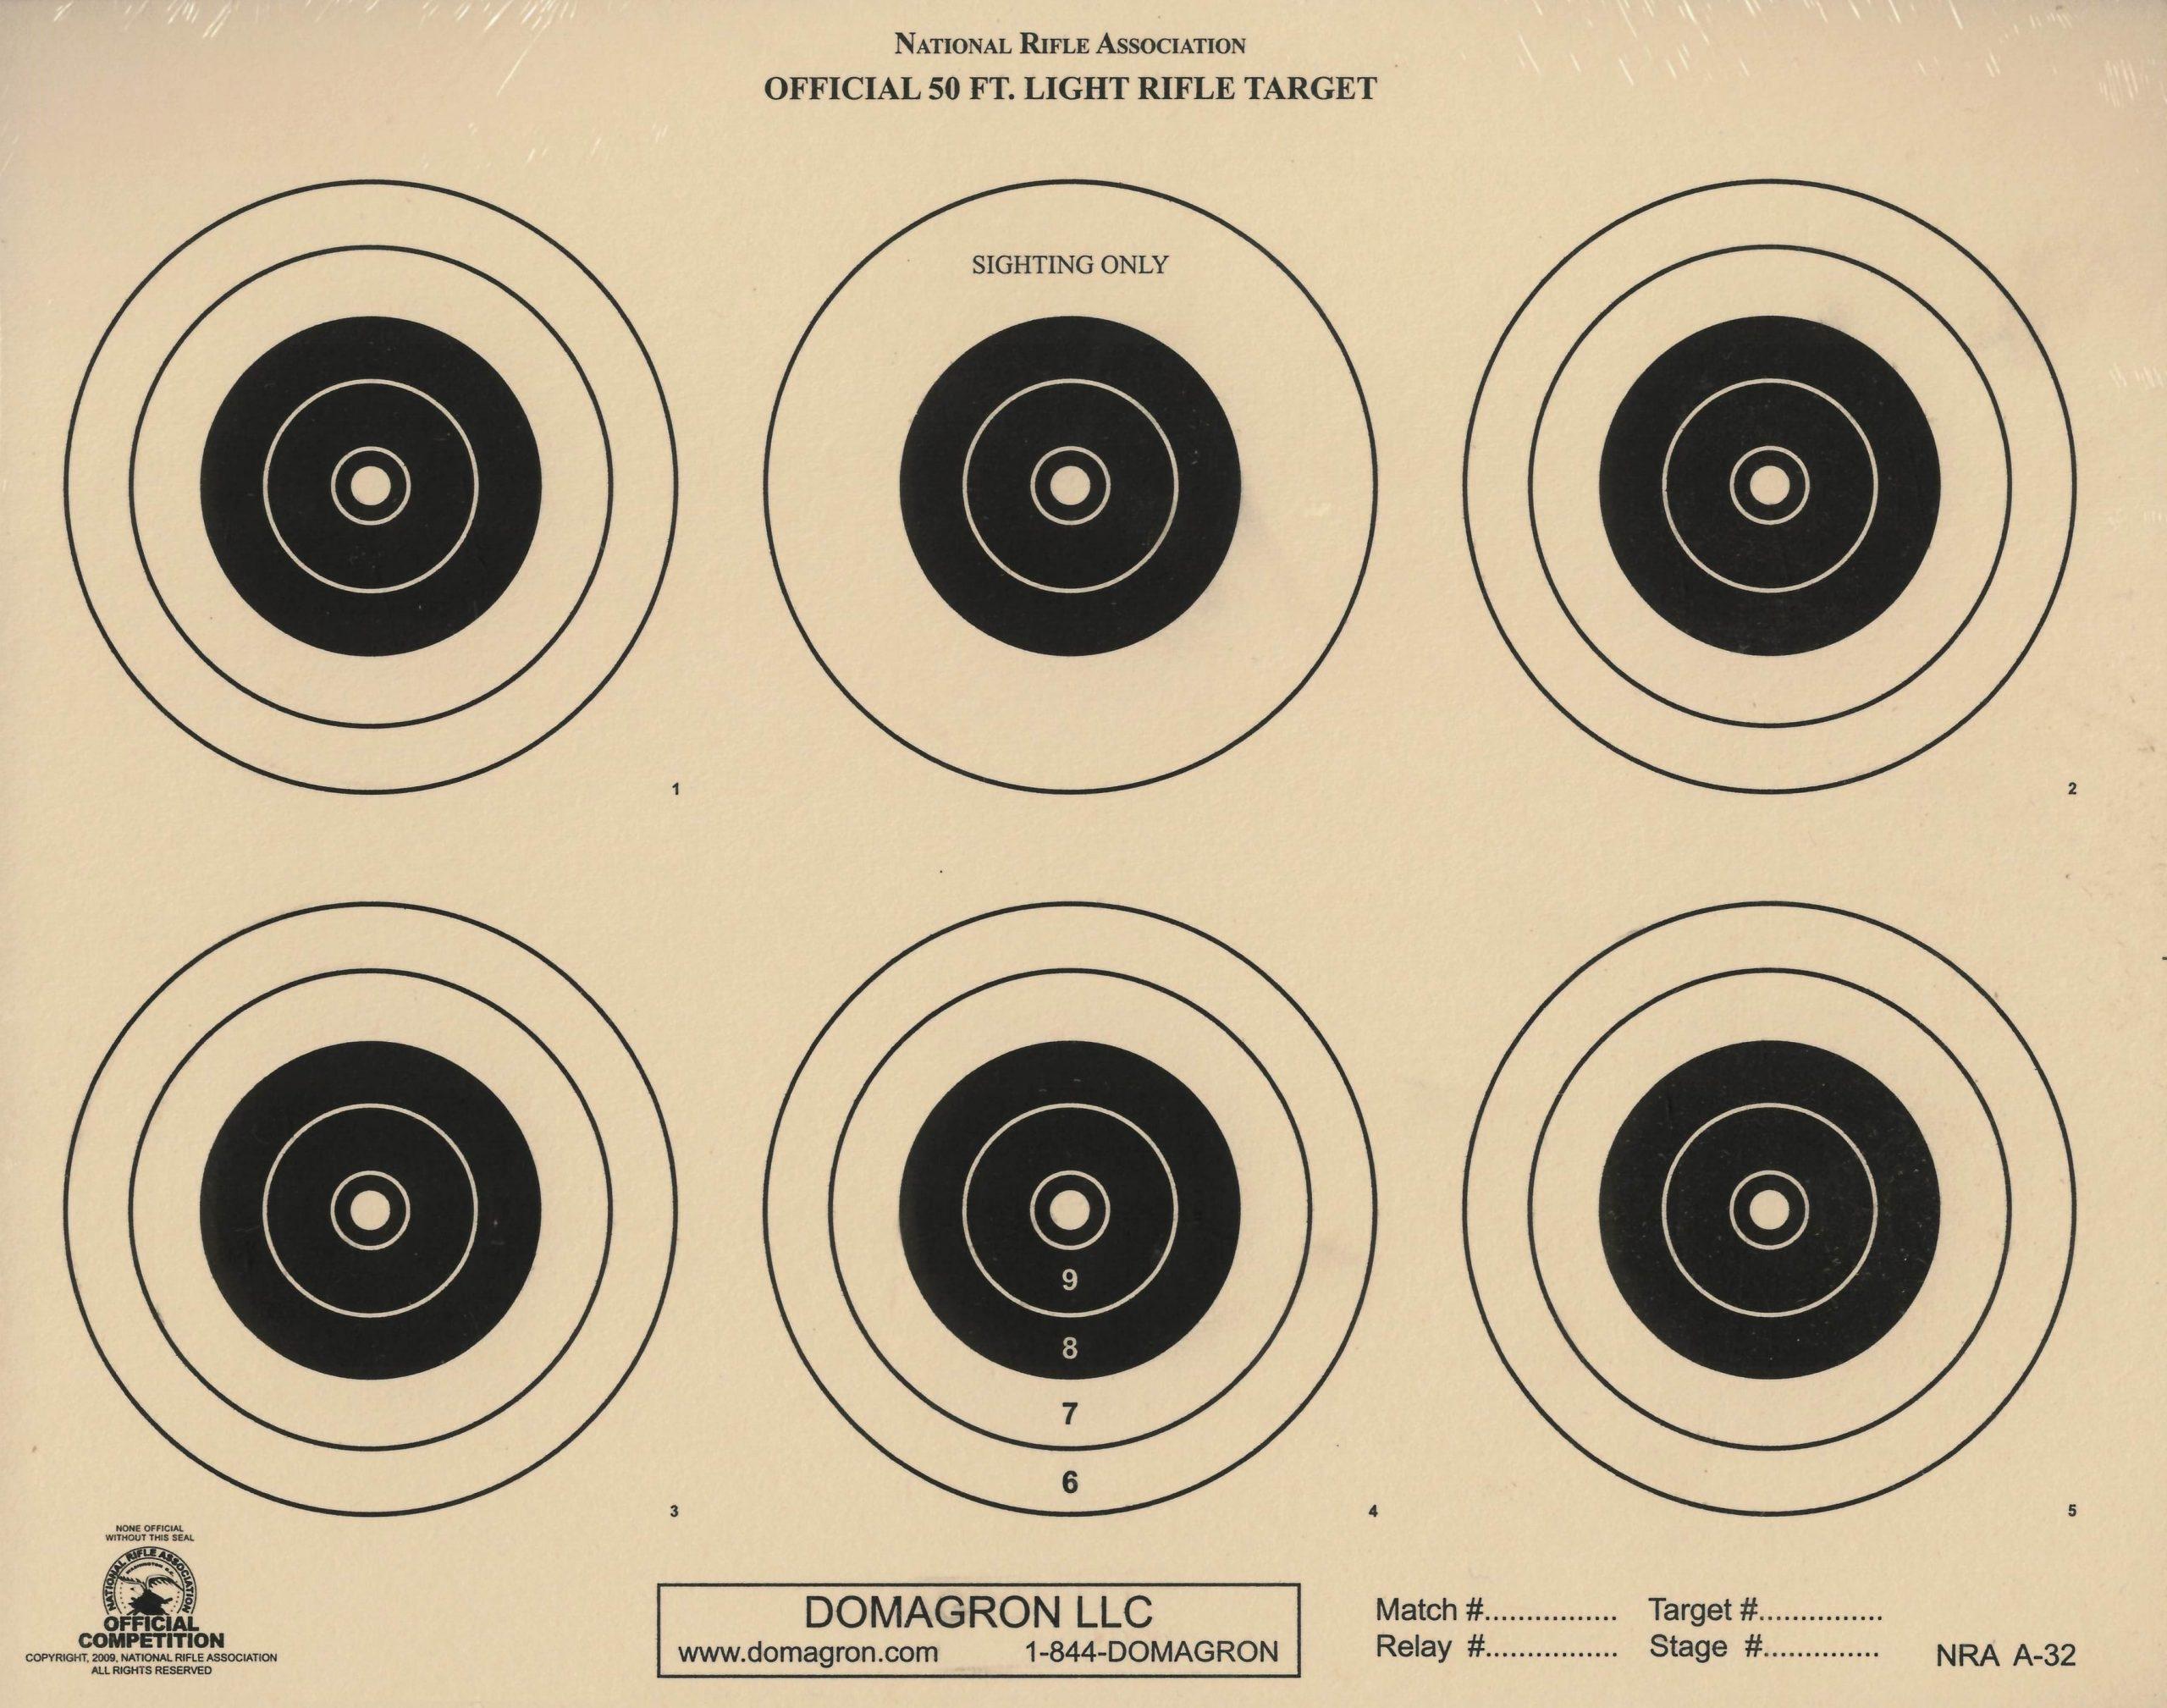 Smallbore 3-position target